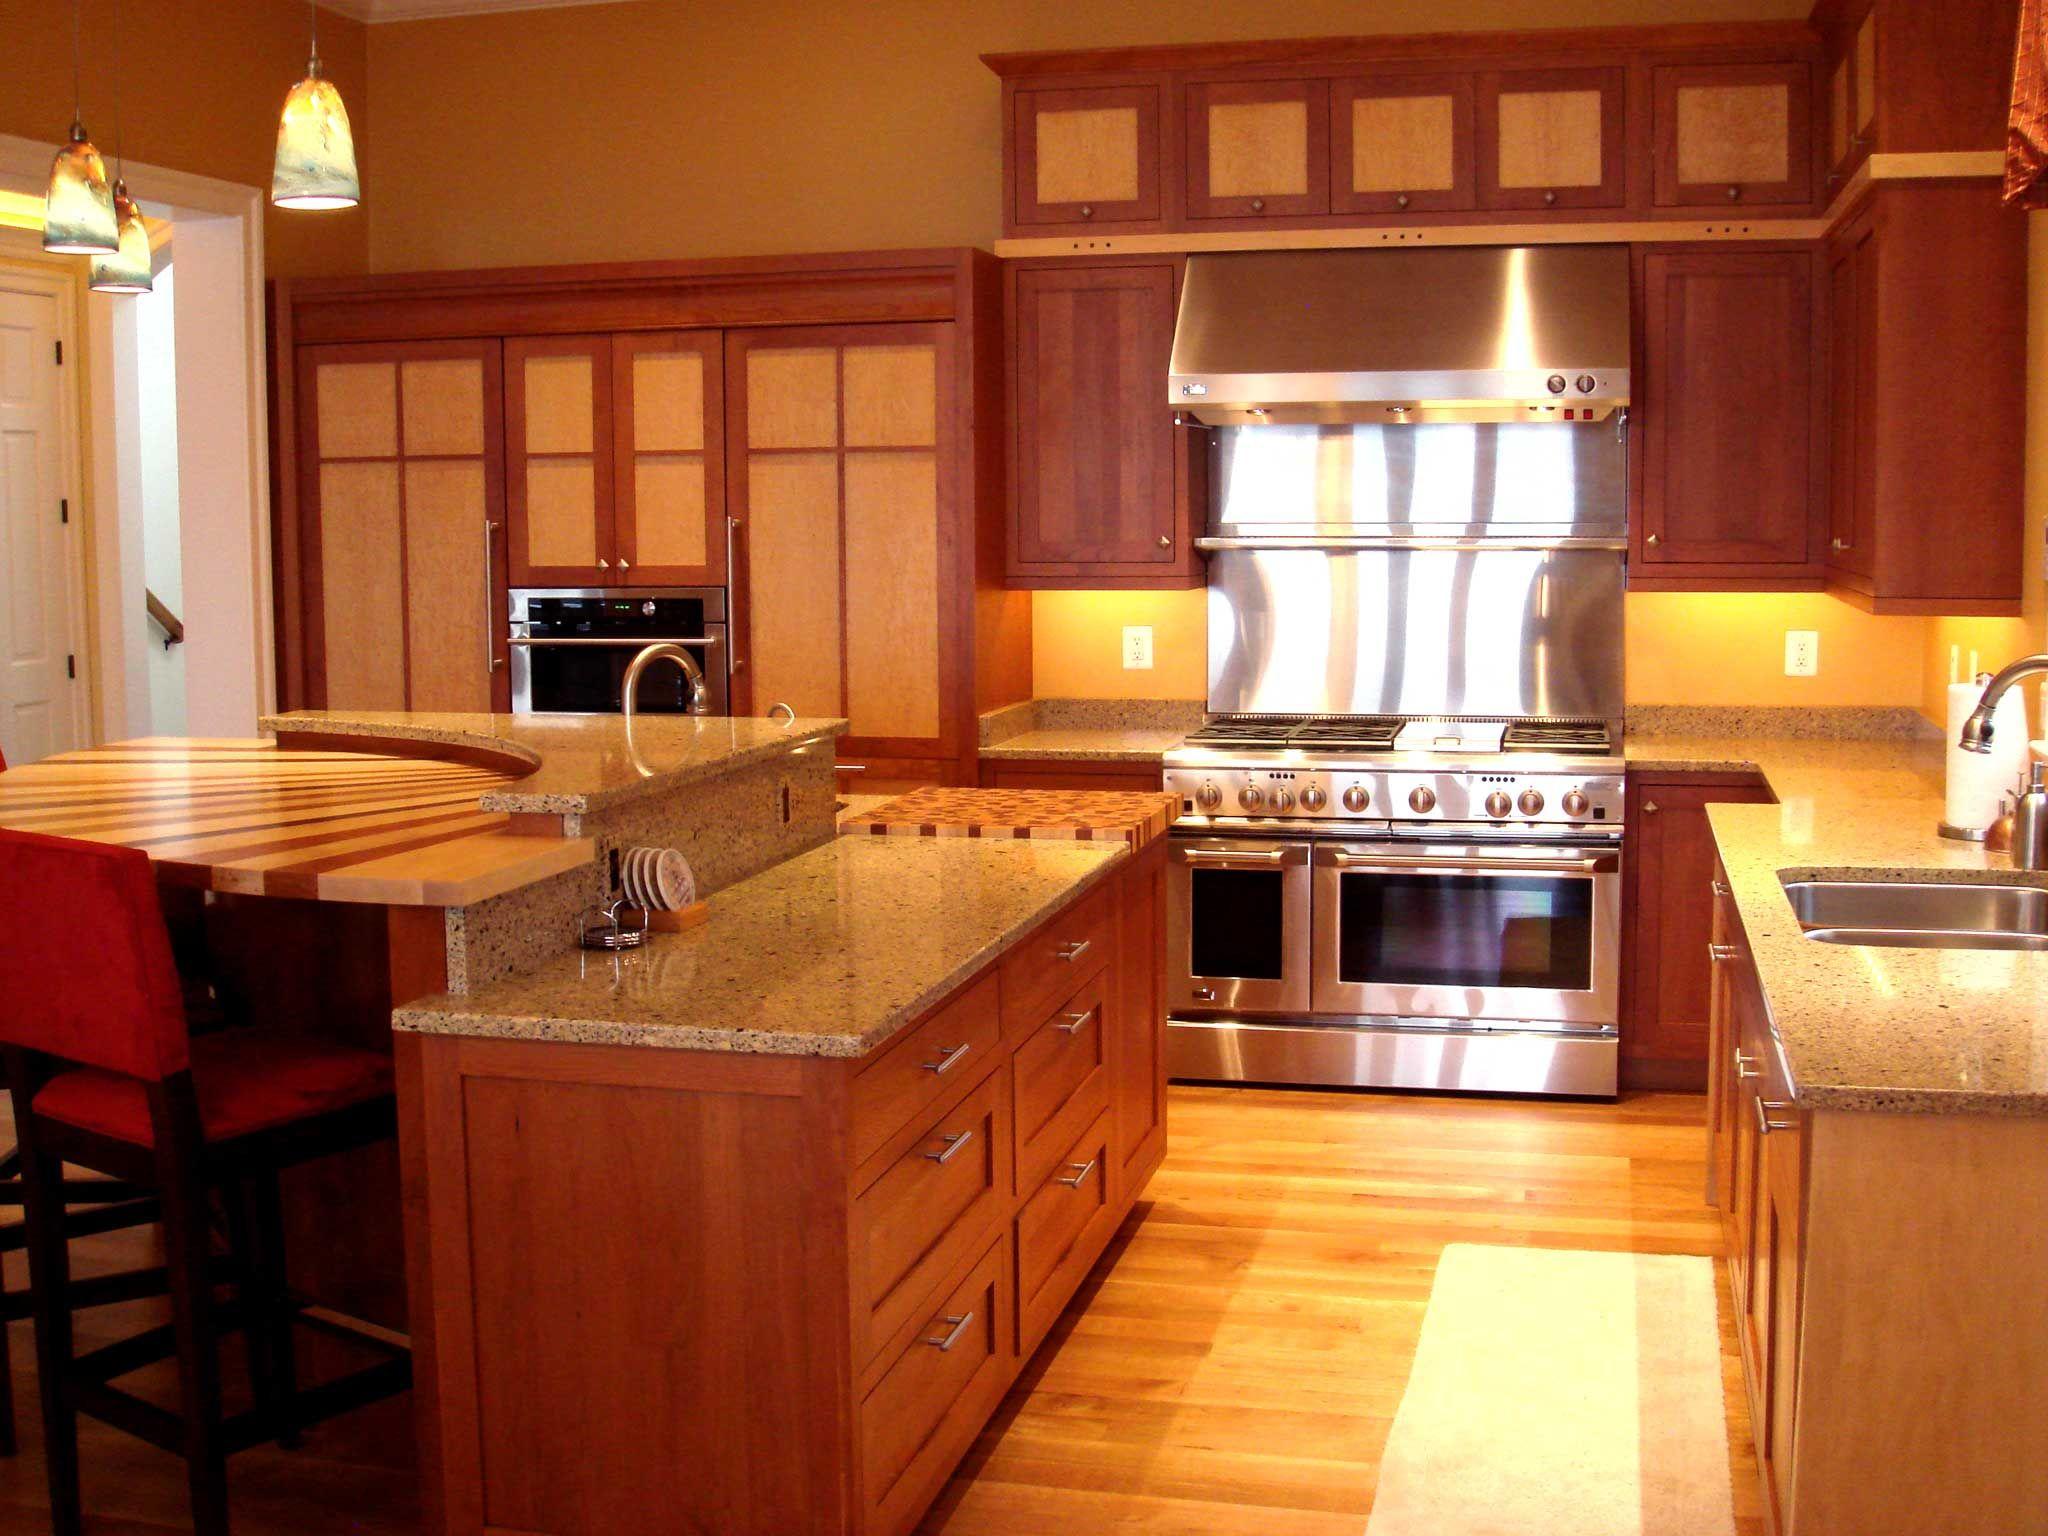 Kitchen Design Granite Alluring Light Medium Tone Wooden Cabinet And Kitchen Island Granite Design Inspiration